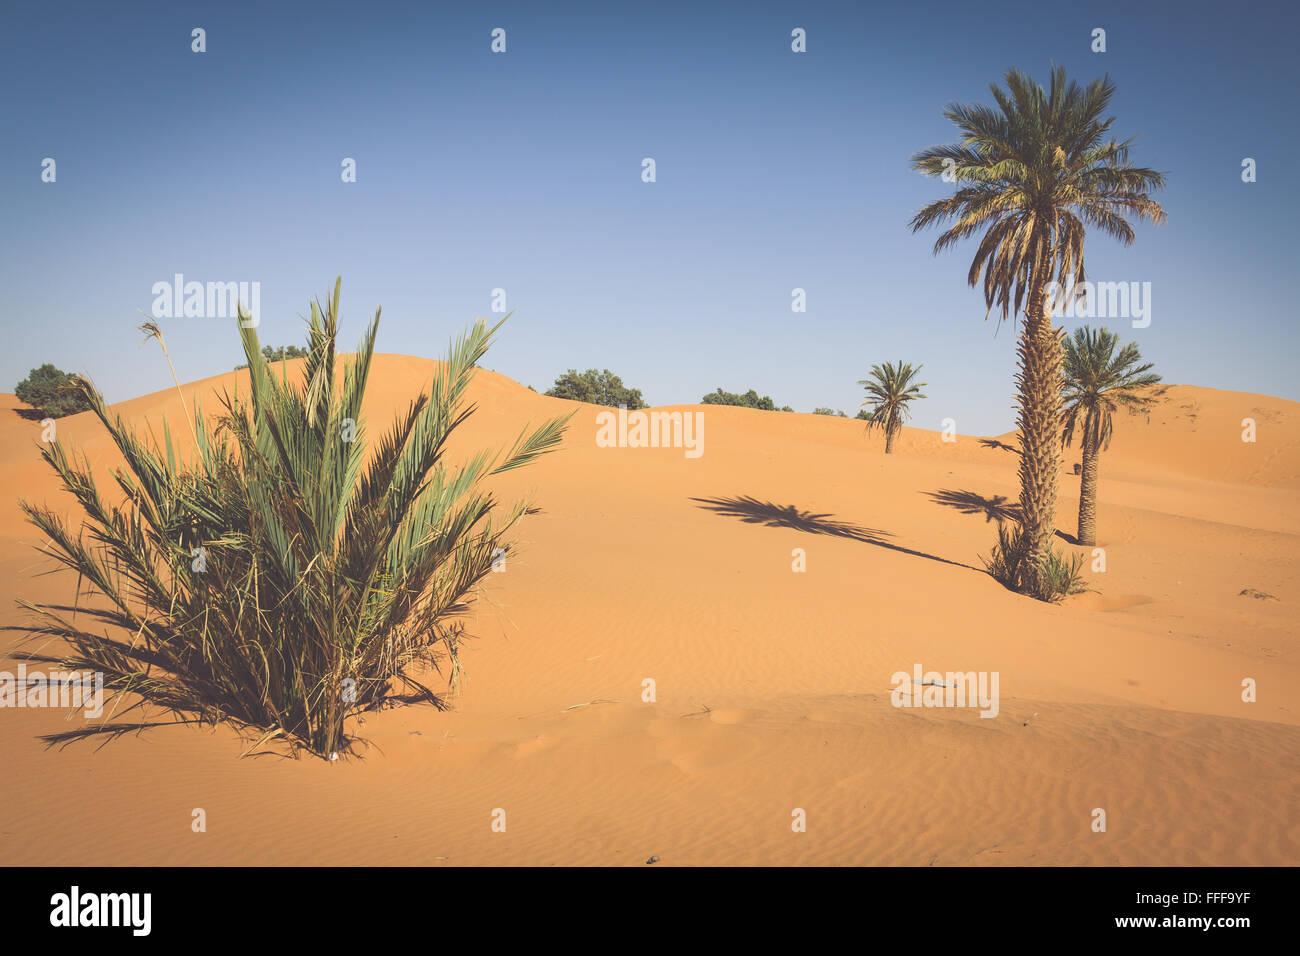 Palm tree in Erg Chebbi, at the western edge of the Sahara Desert - Stock Image